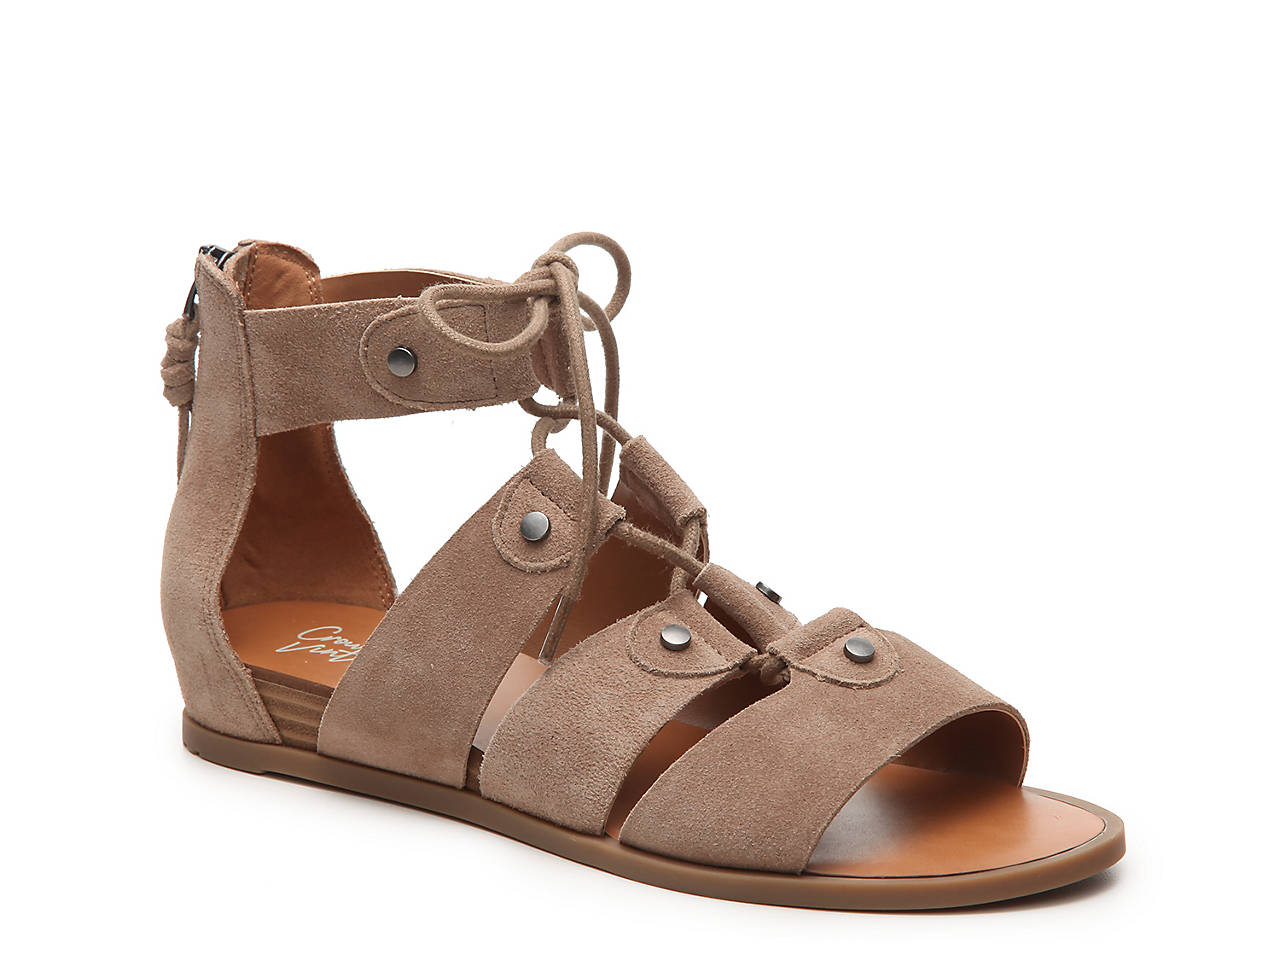 bef72da672c Crown Vintage Aliaa Wedge Sandal Women s Shoes